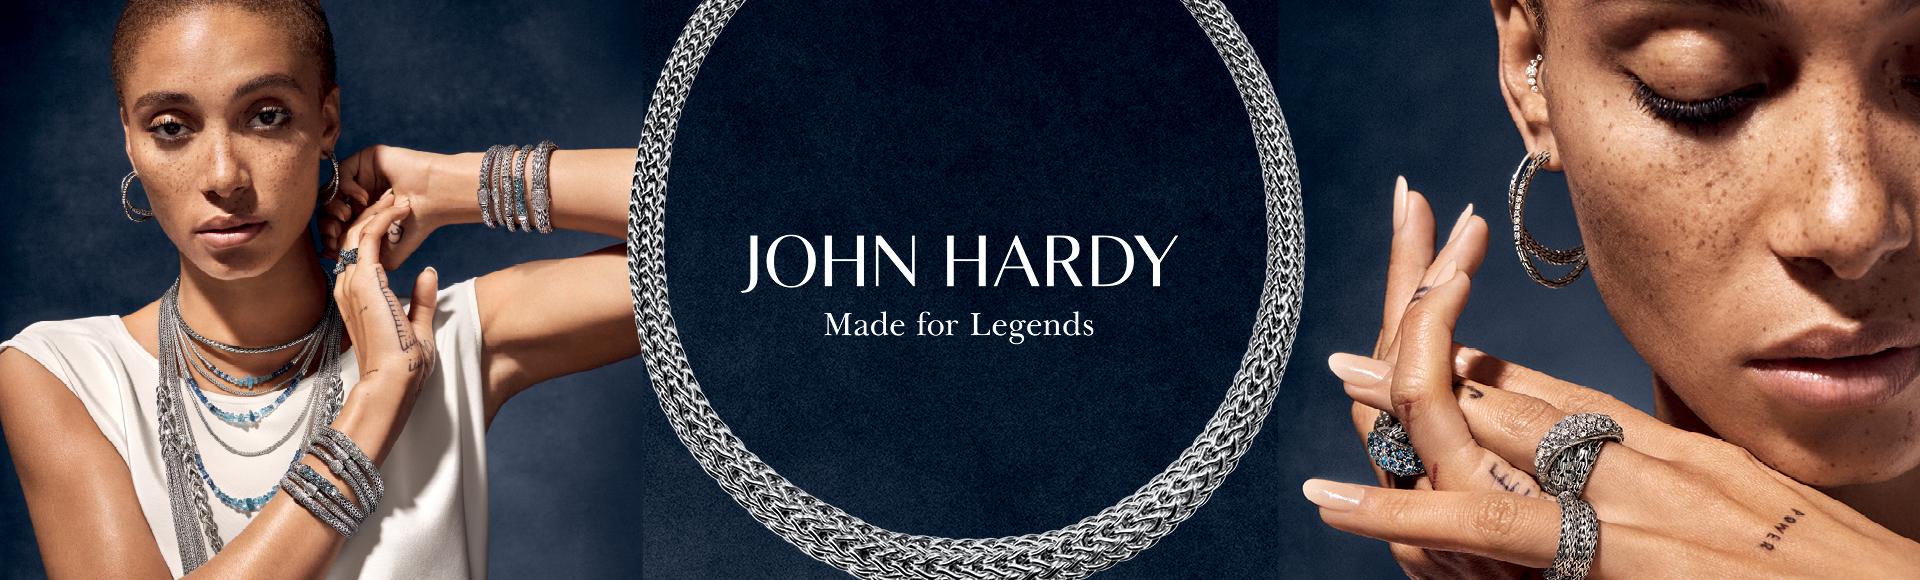 Introducing John Hardy